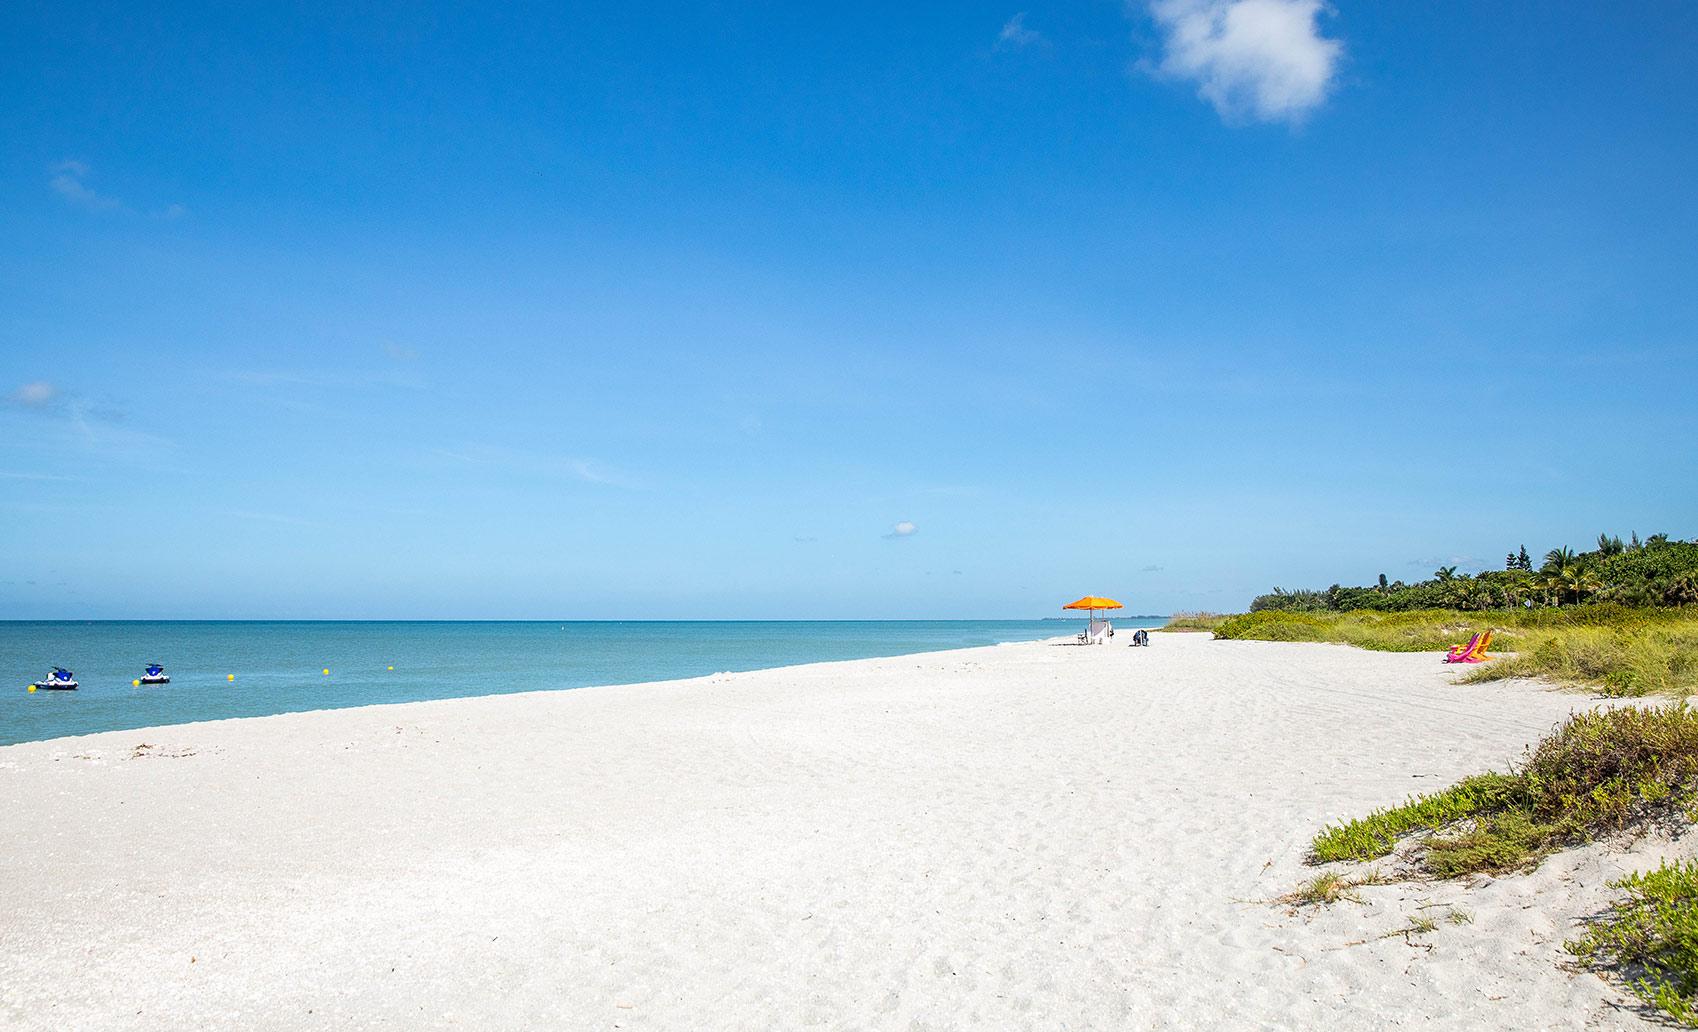 Best Beaches in Florida, Captiva Island